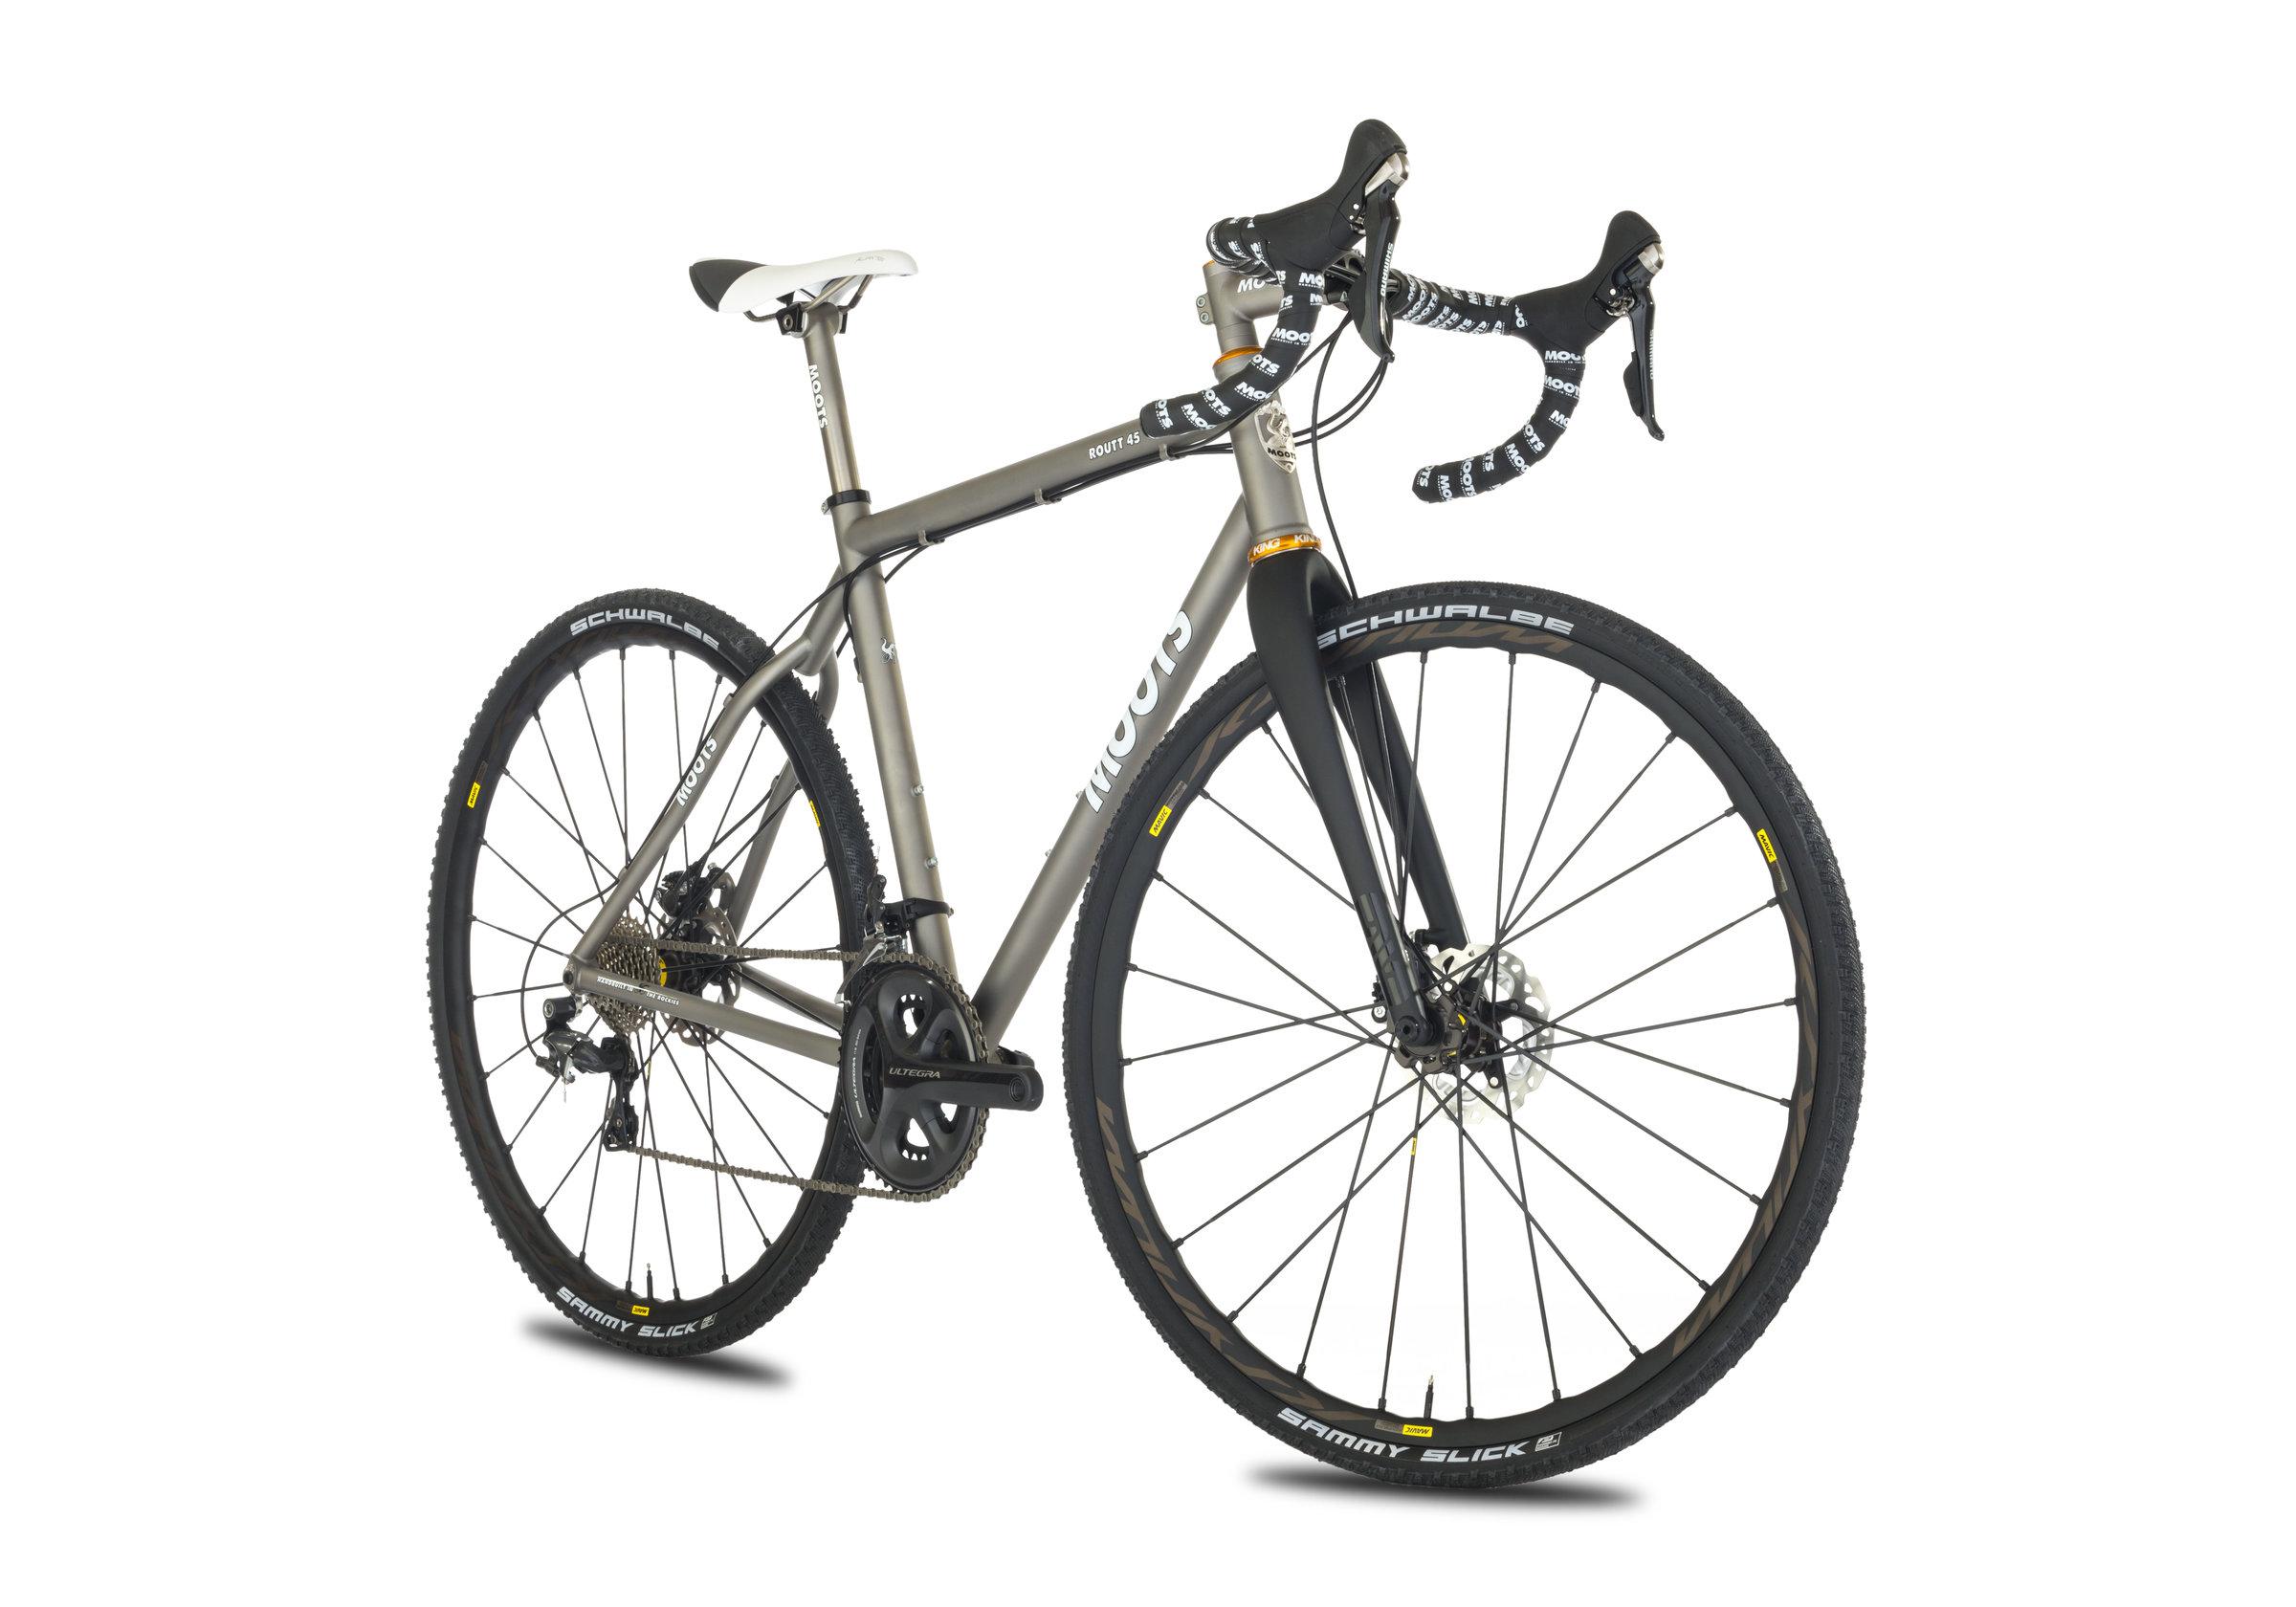 Routt 45 Gravel / Adventure / Bikepacking Bike